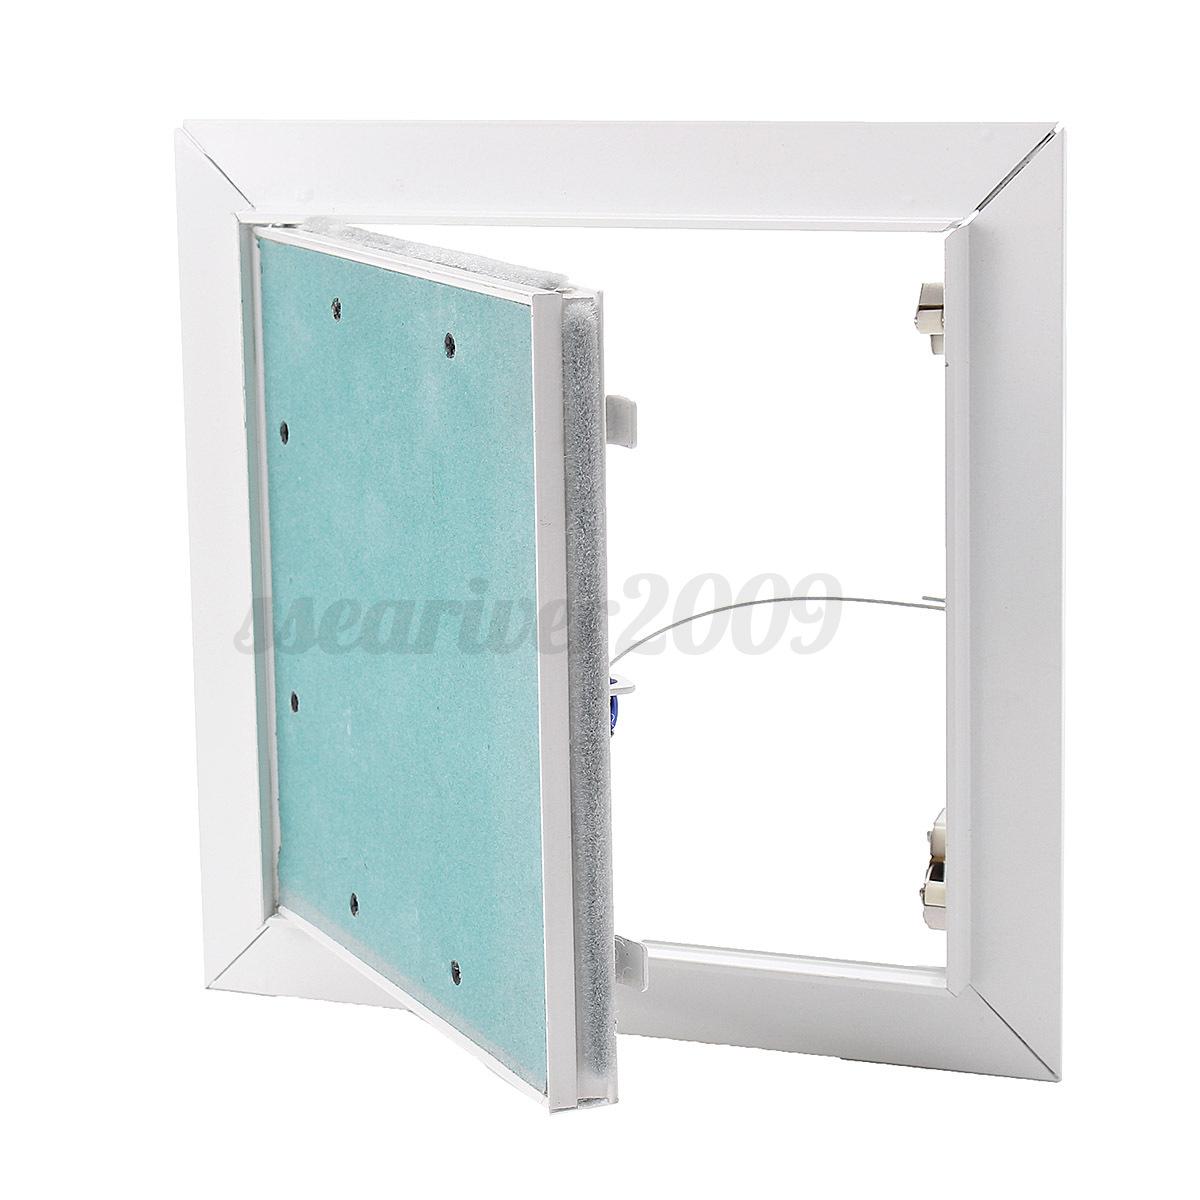 Aluminum Access Doors : Aluminum damp proof access parget panels inspection loft